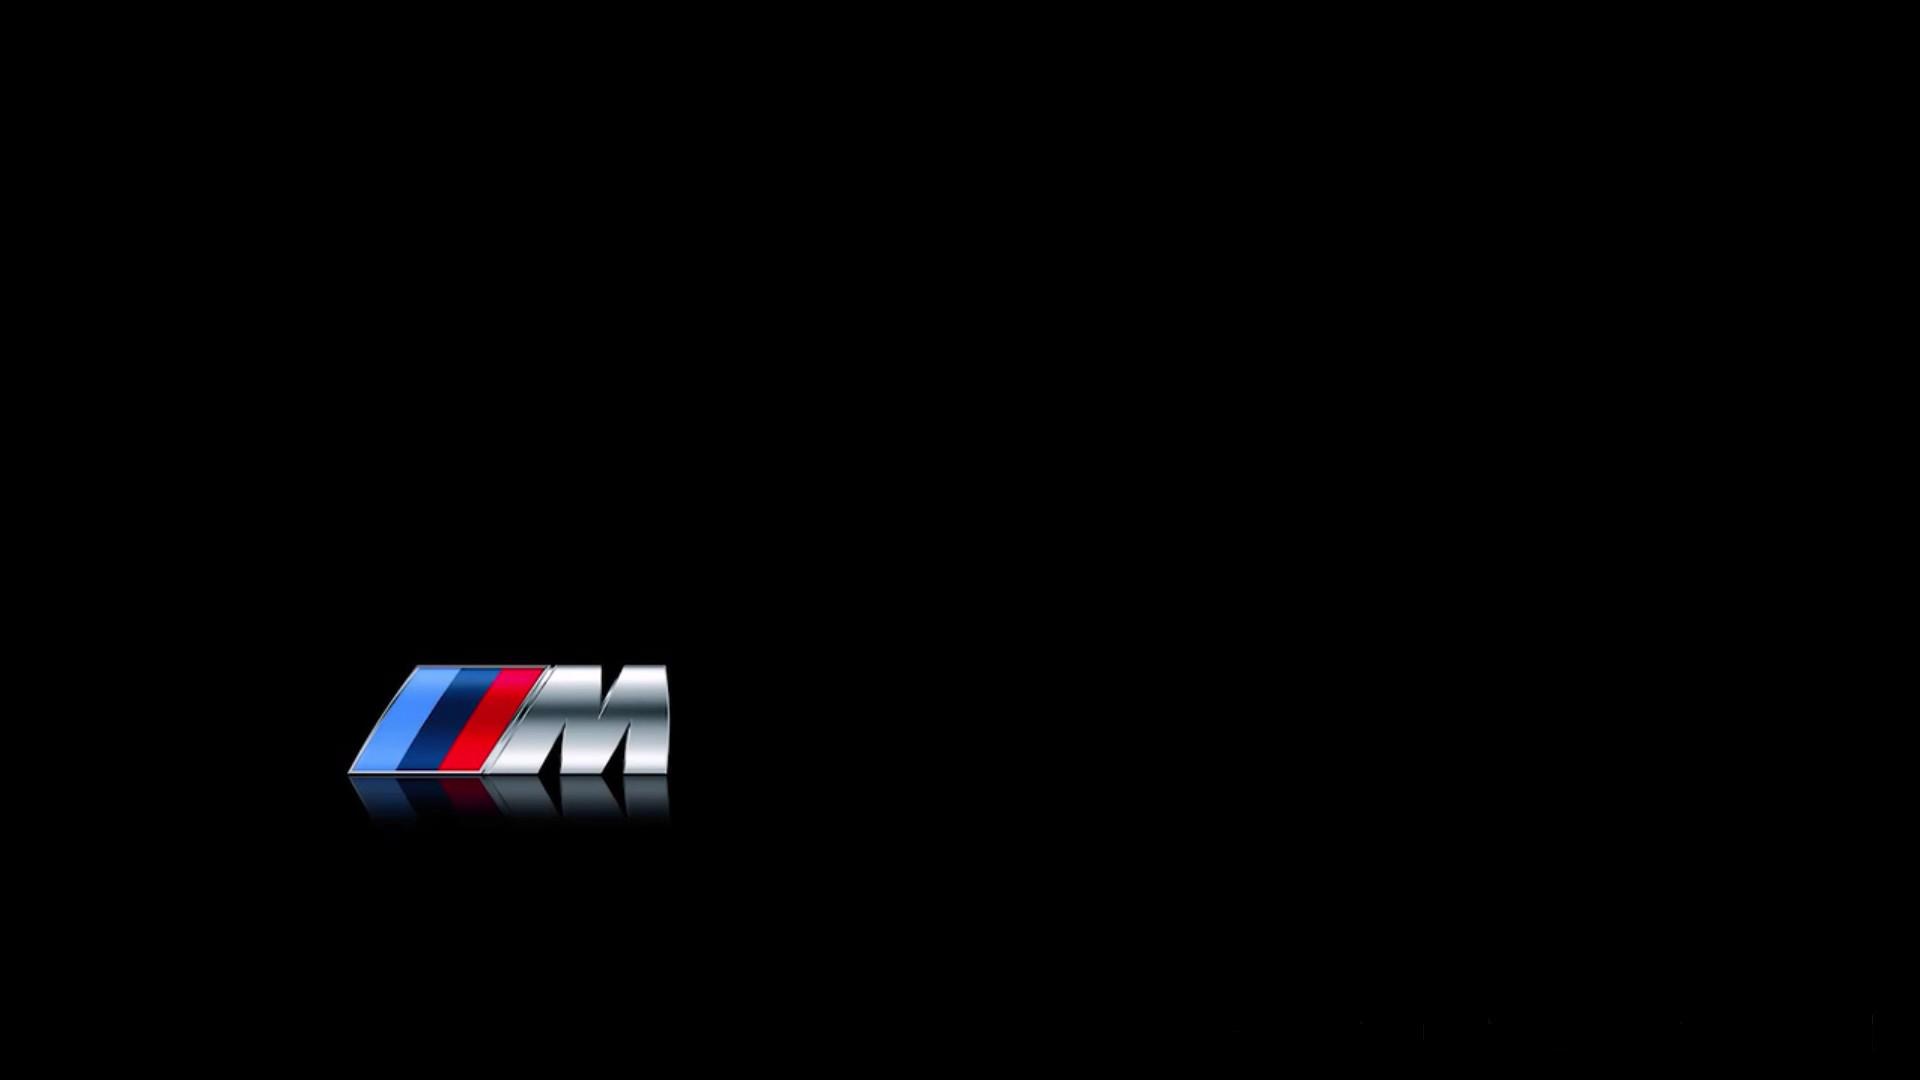 Bmw M Logo Wallpaper 62 Images